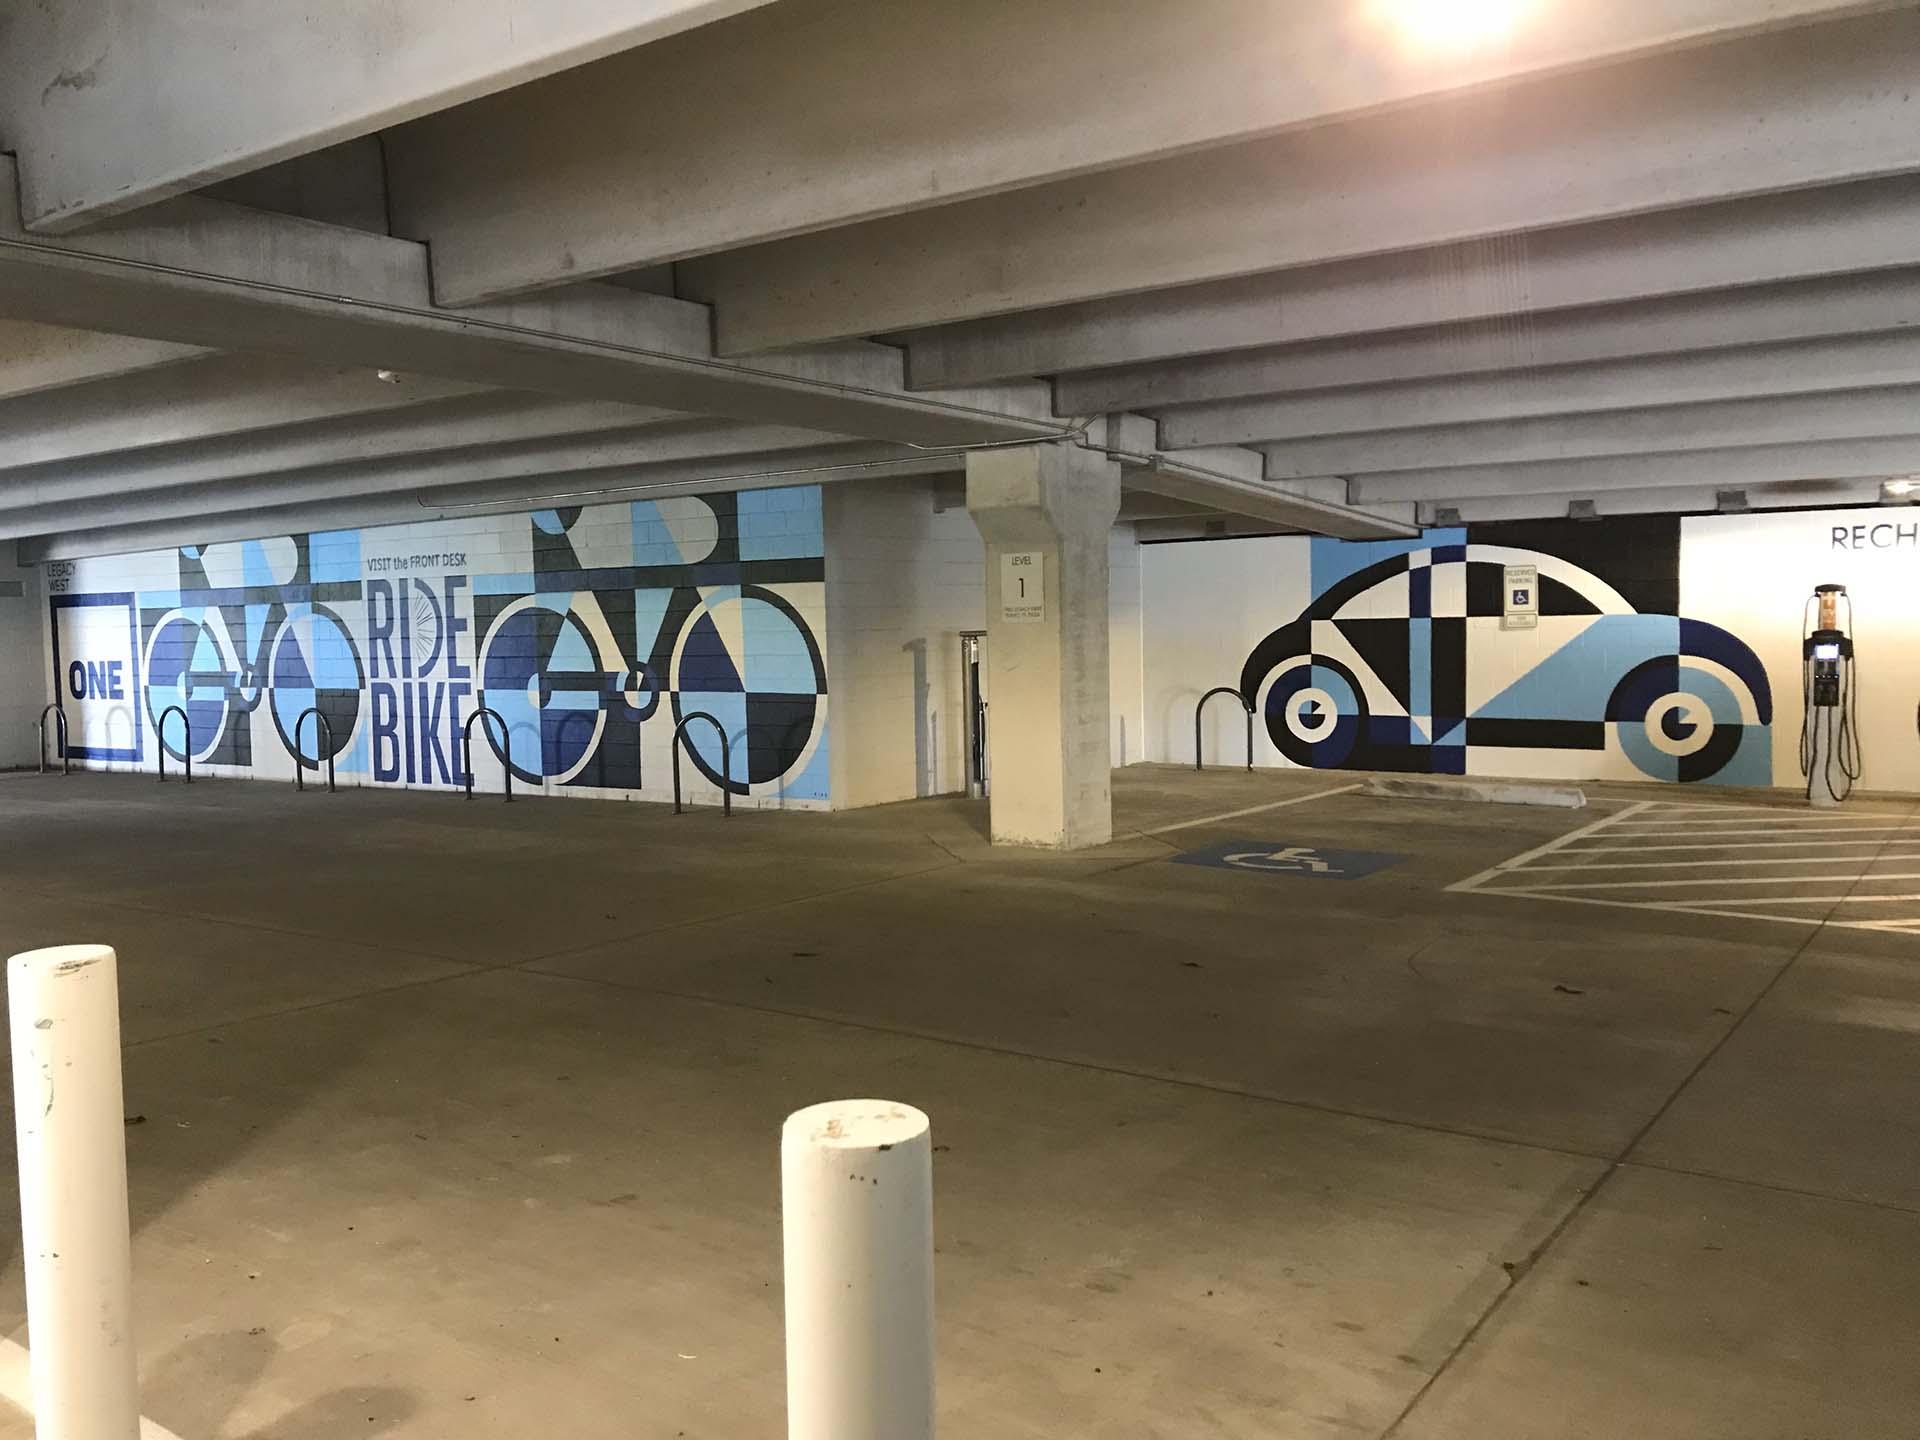 Car mural - custom mural - mural - Dace Kidd - Mural Artist Tx